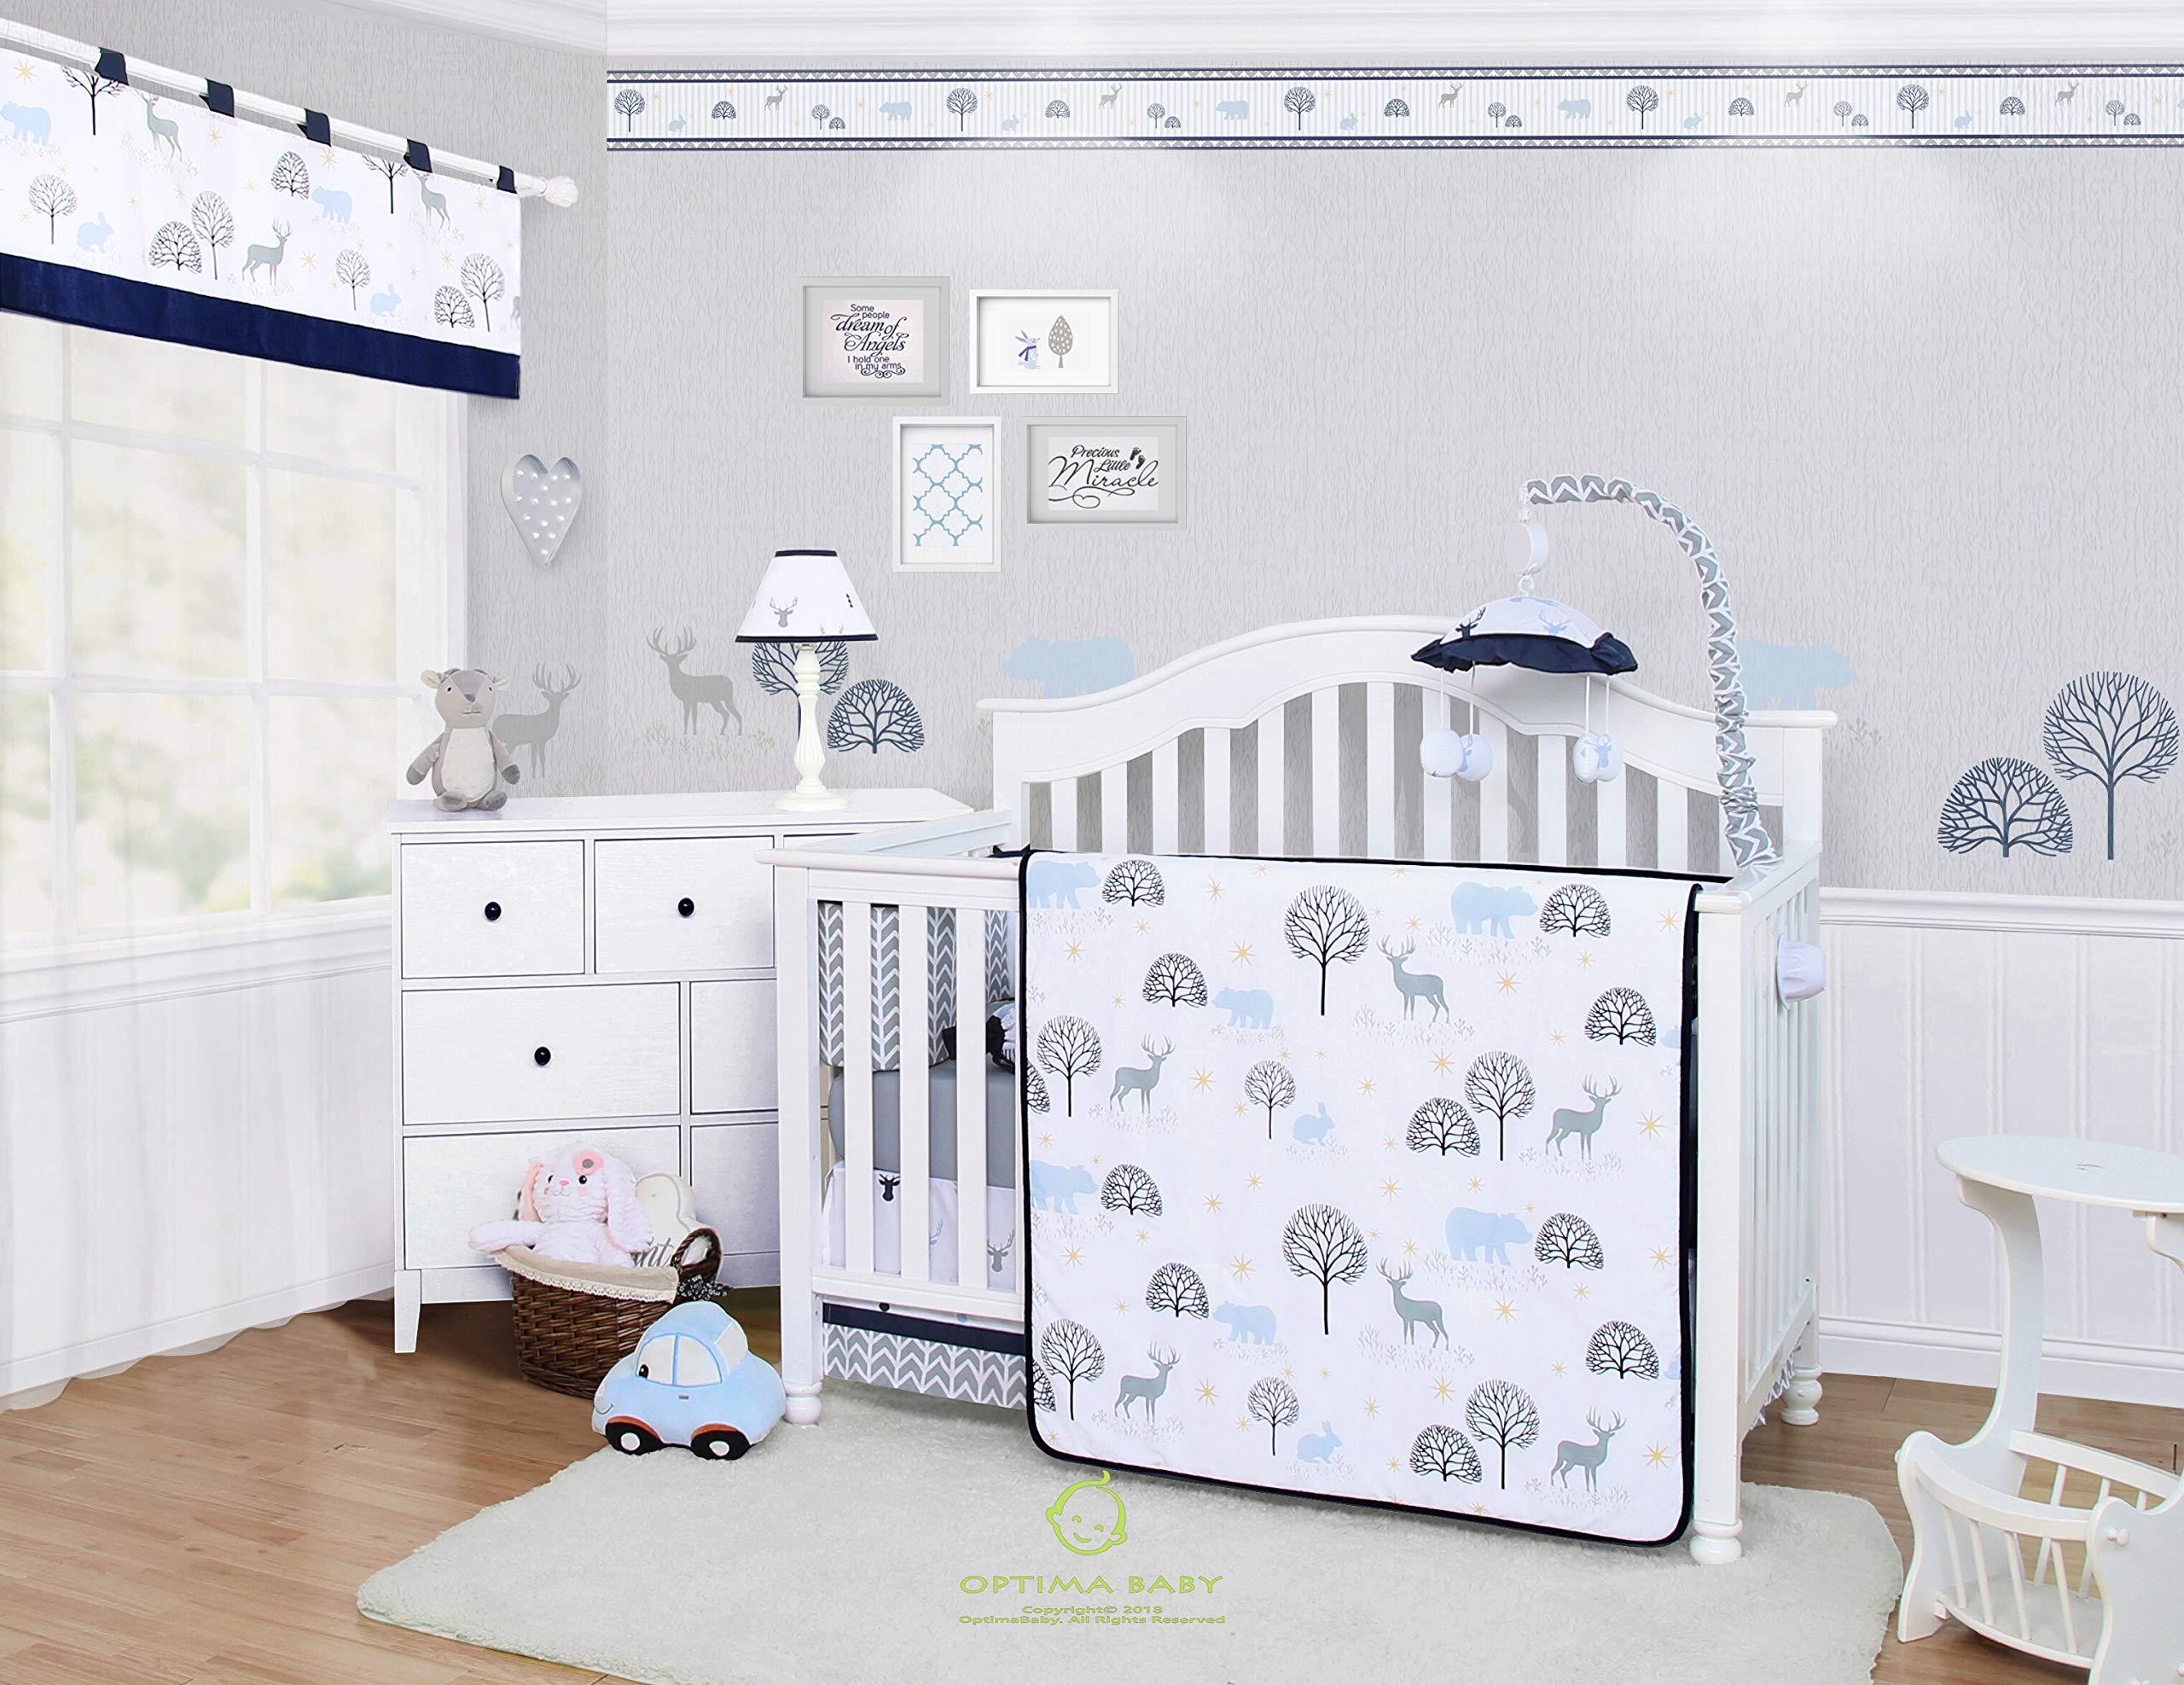 OptimaBaby Woodland Forest Deer 6 Piece Baby Nursery Crib Bedding Set